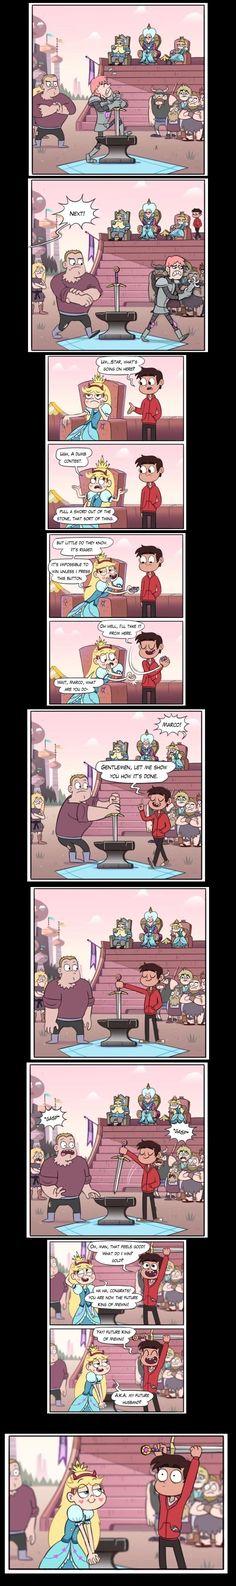 pfffffffffffffffft hahahahahahha marco though